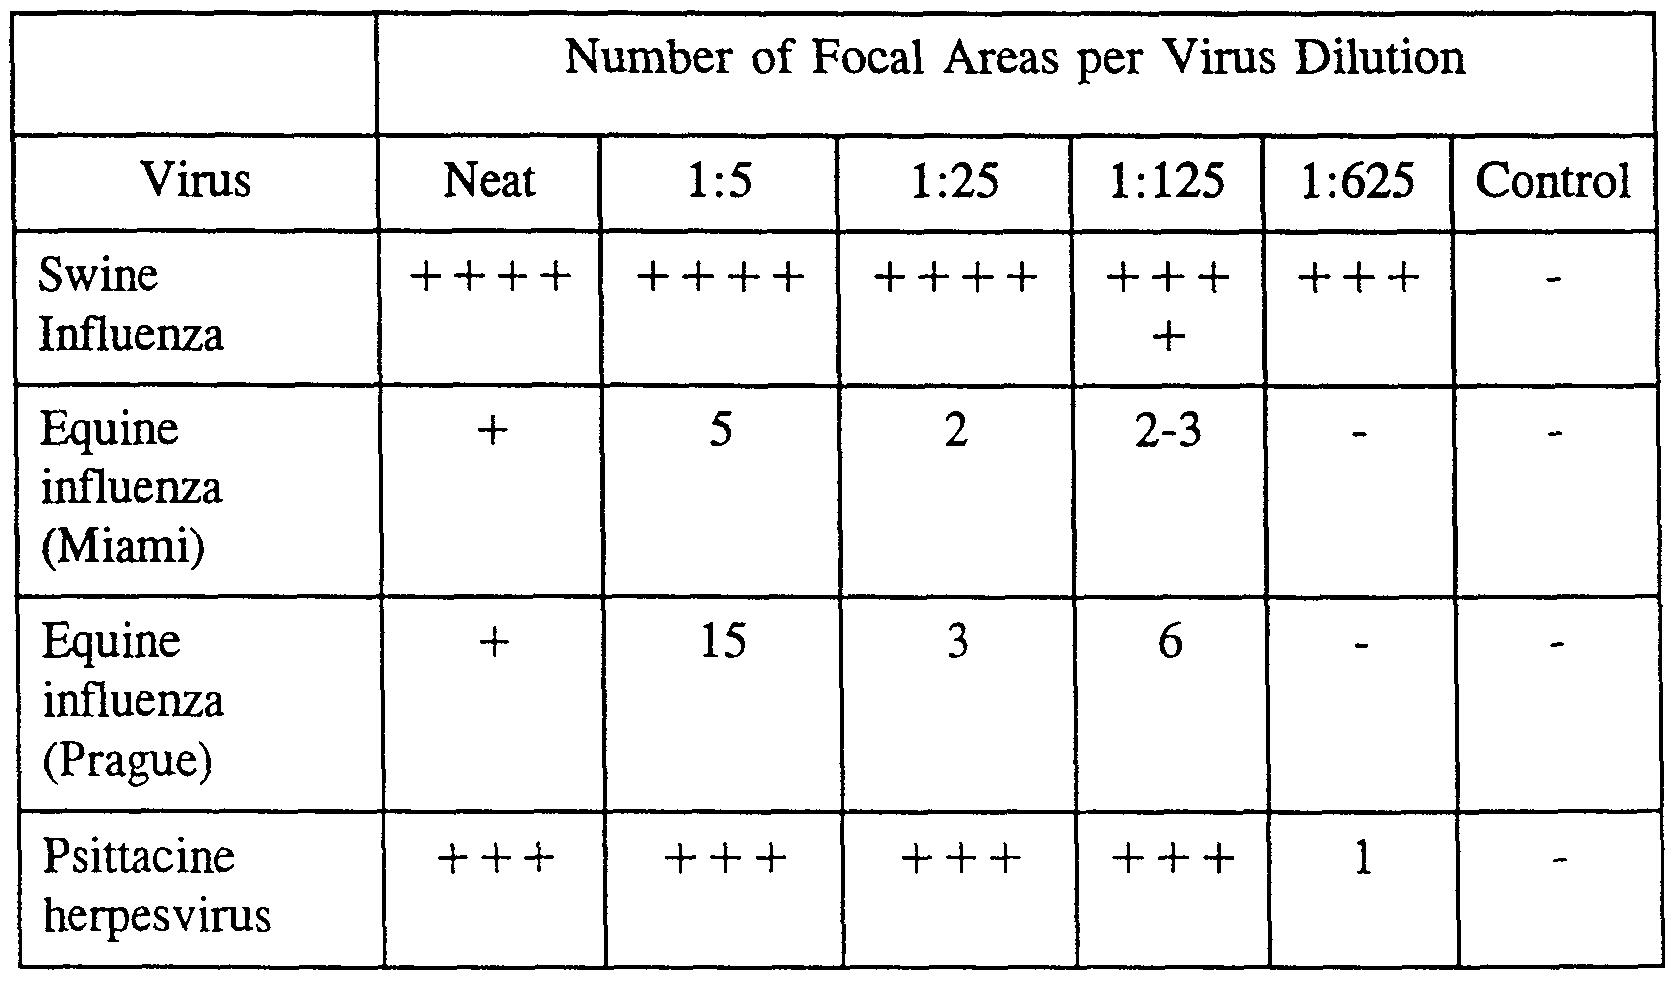 brevetto woa immortal avian cell   grow avian  animal viruses  produce